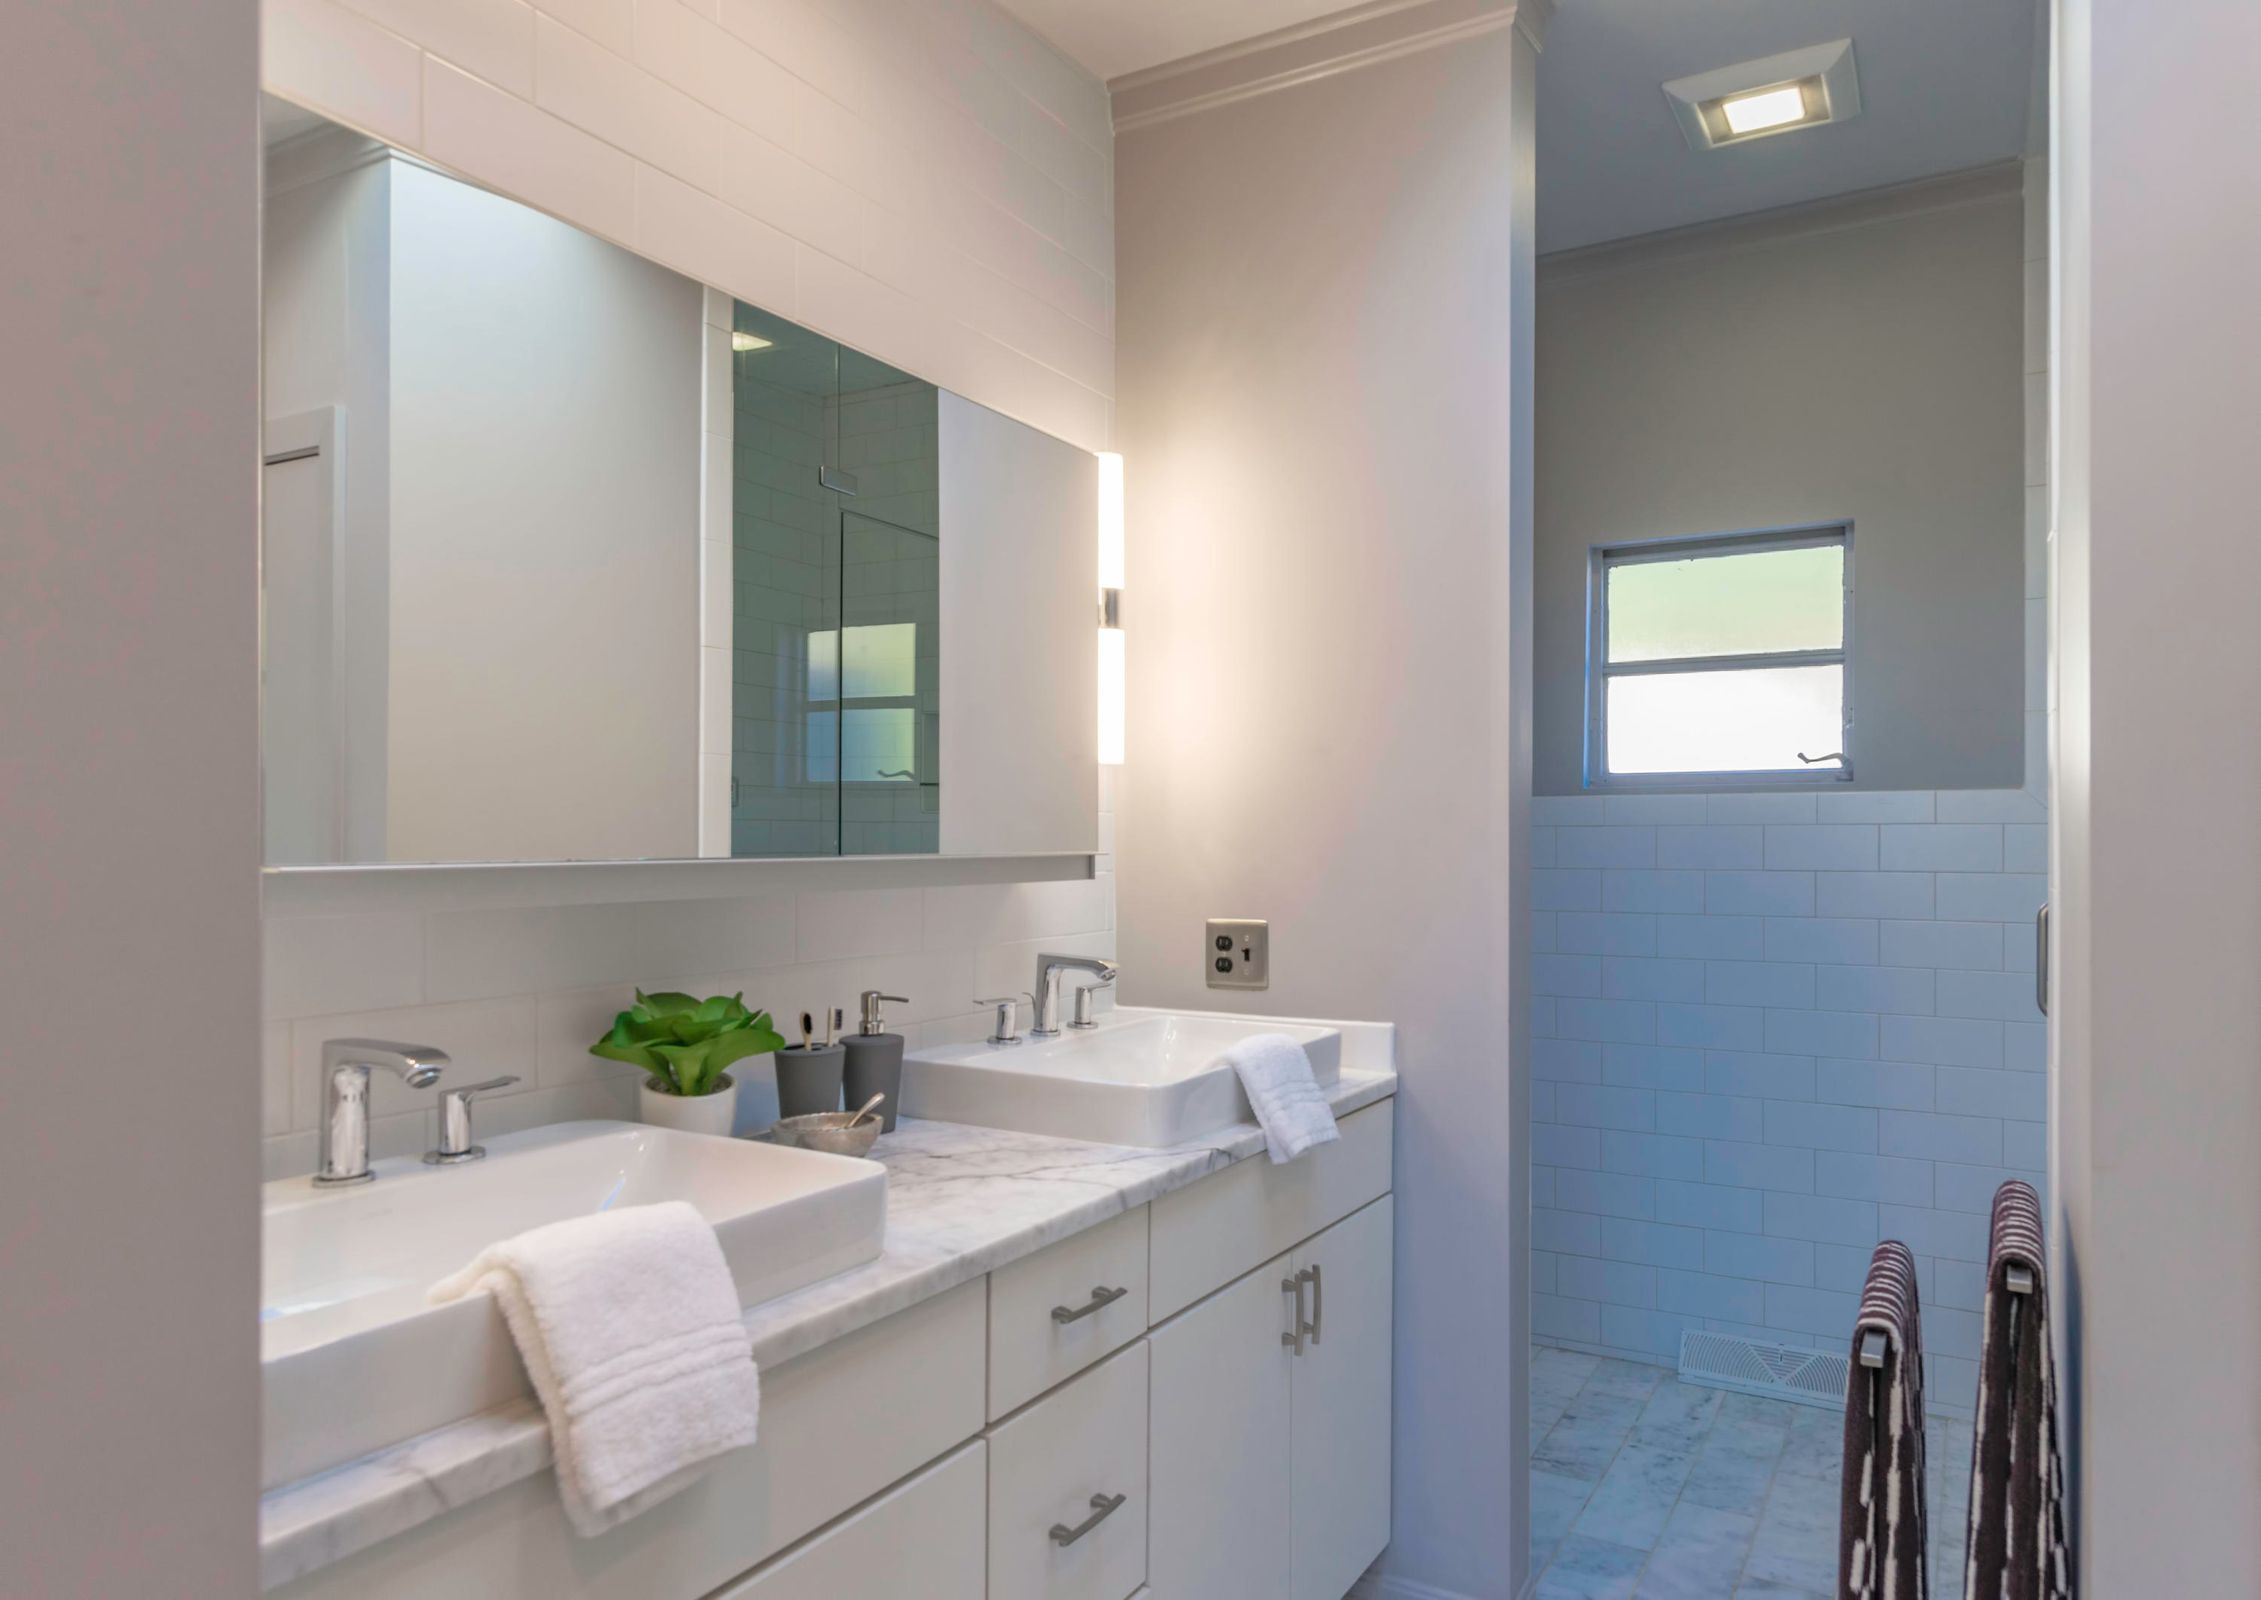 DSC_2037 - Master Bathroom